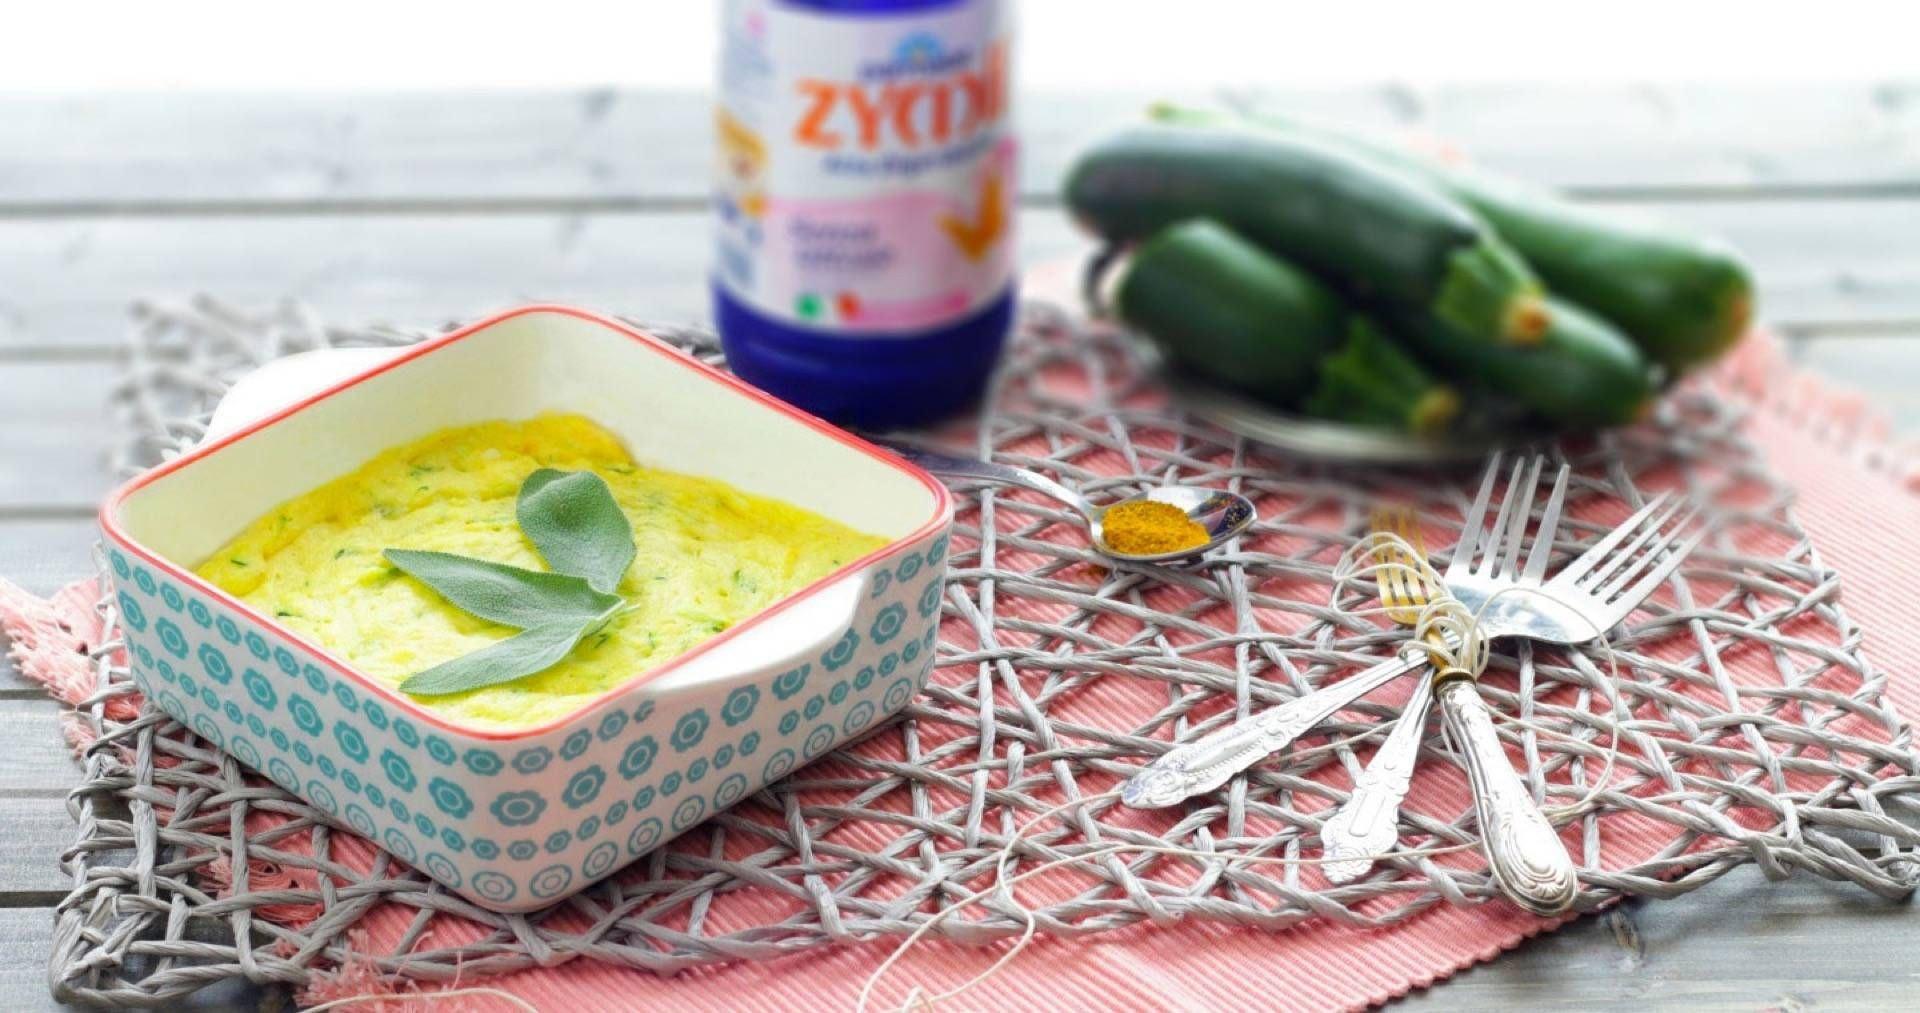 Cake salata alle zucchine e curry - Parmalat